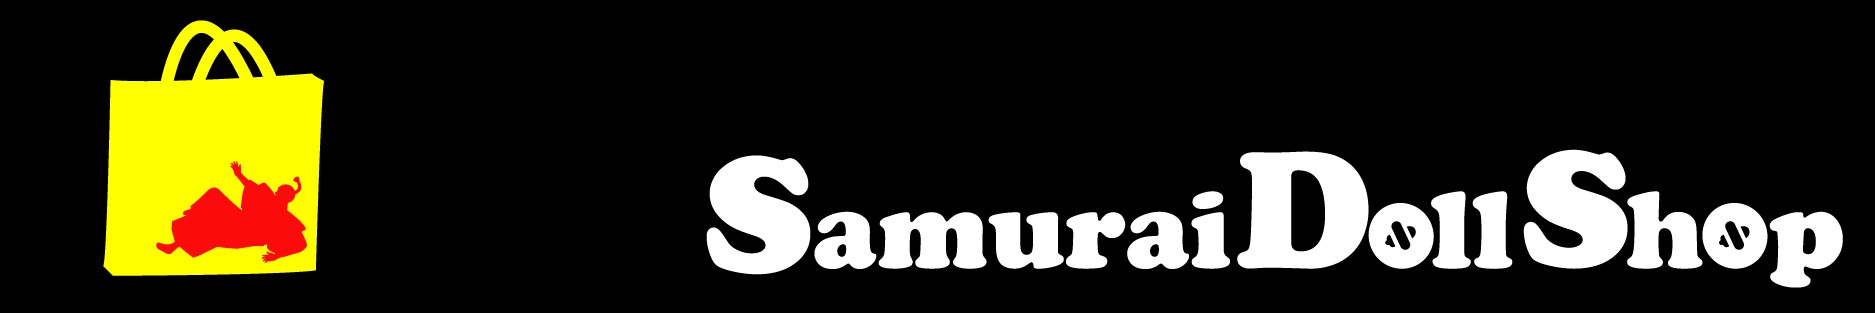 samuraidoll